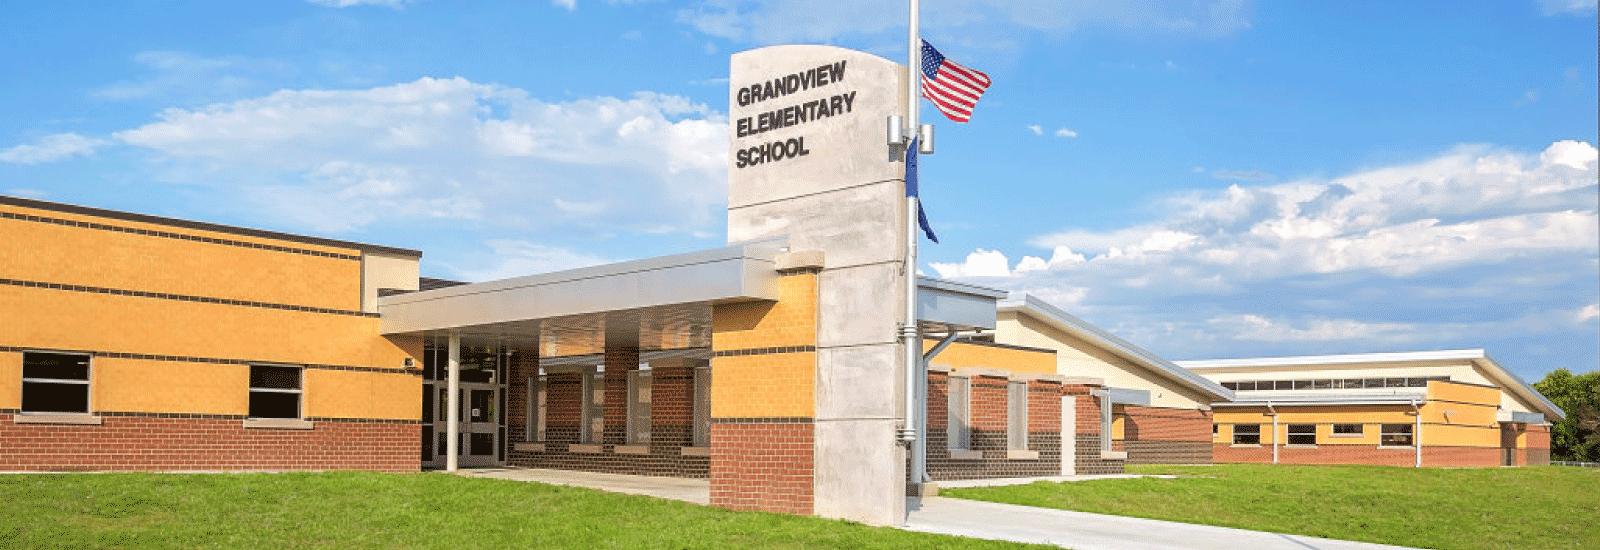 Grandview Elementary School, Rapid City, SD